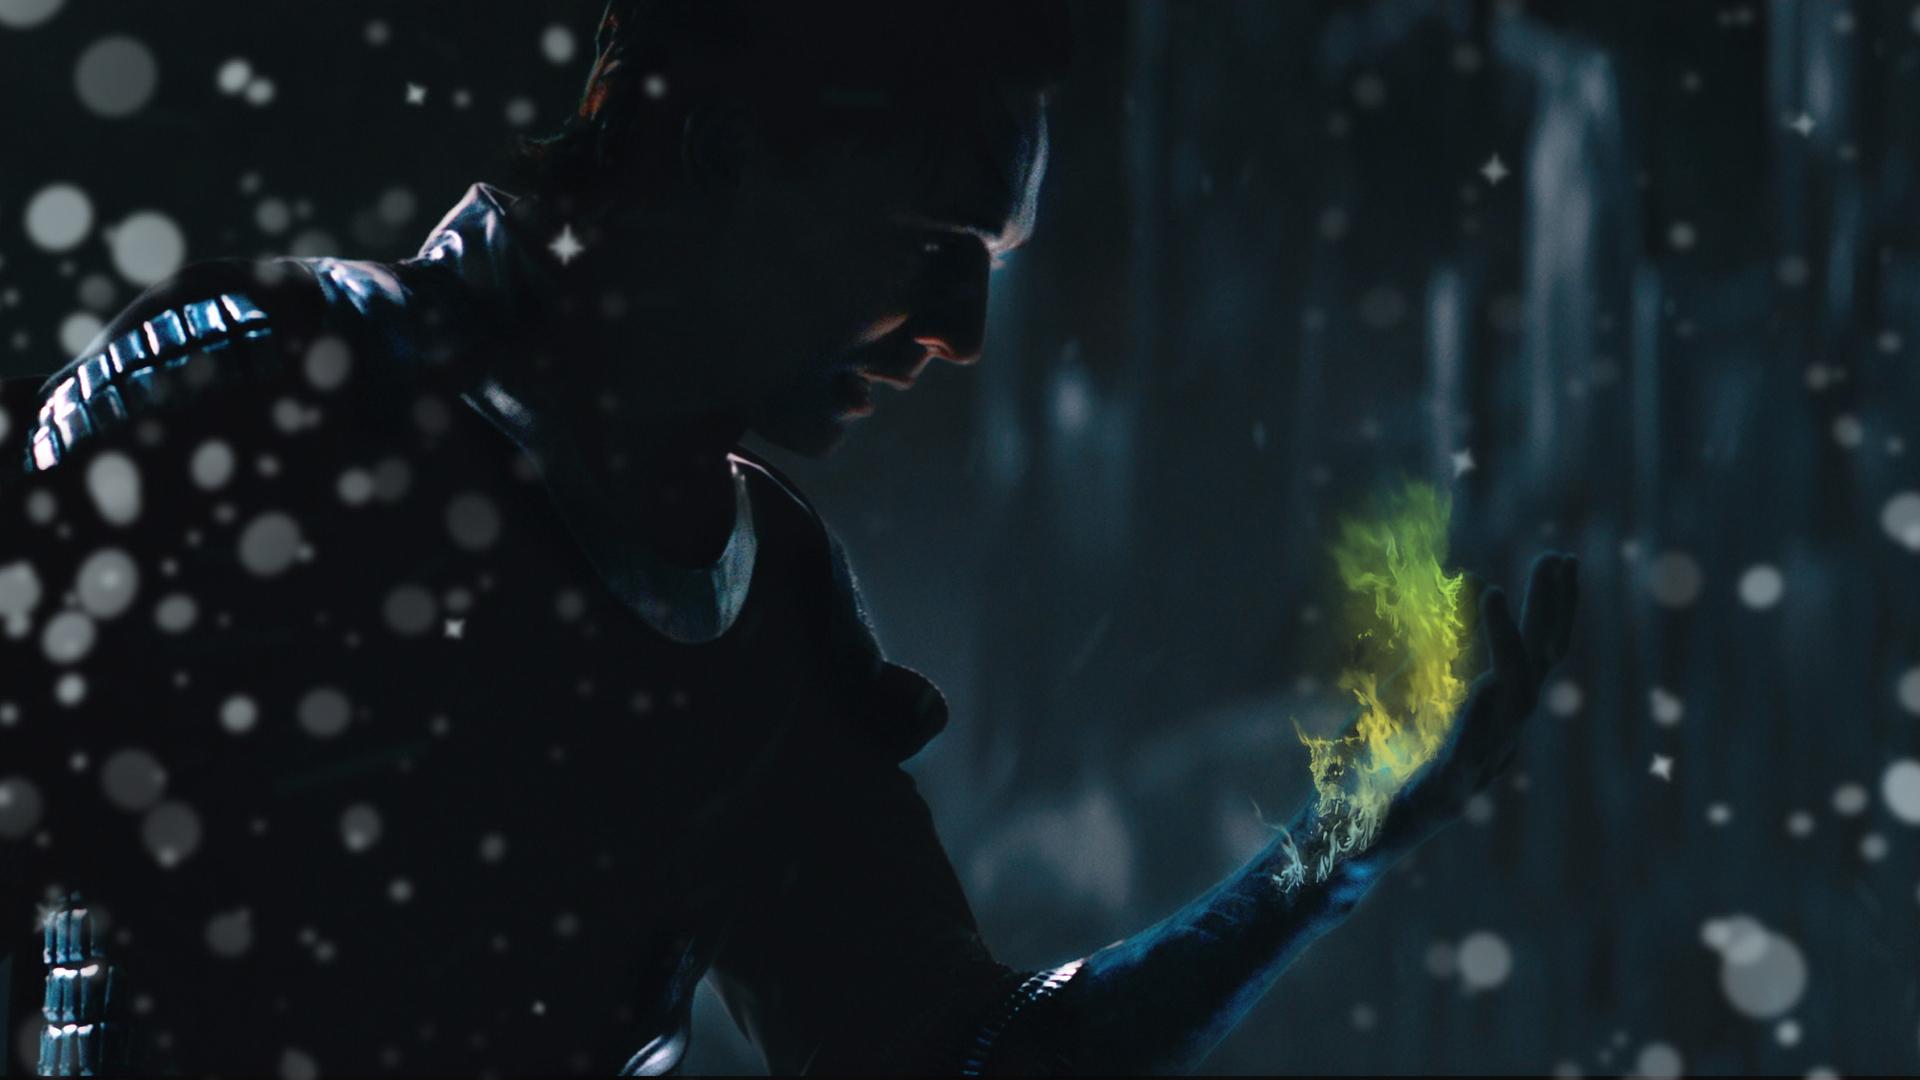 Loki - Wallpaper 4 by RancidRainbow